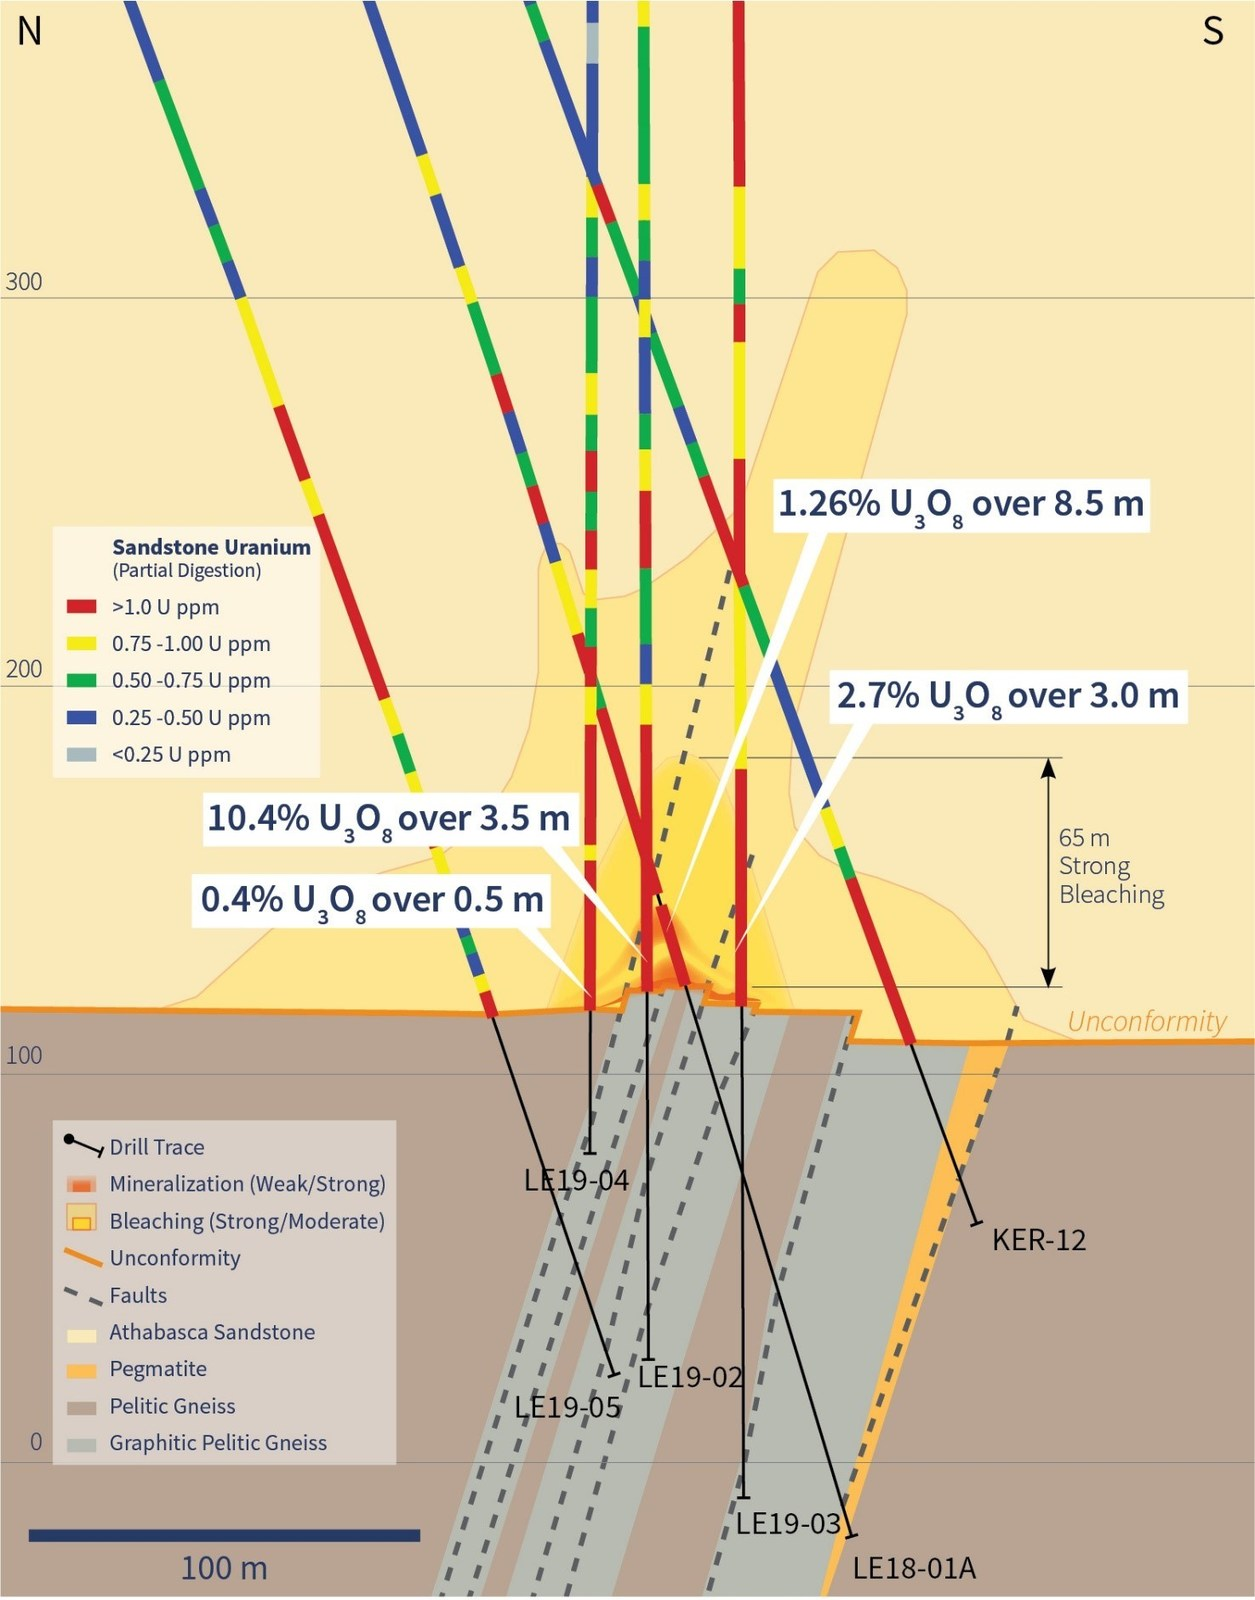 Figure 2 – Sandstone Uranium Geochemistry and Alteration on section 4560E